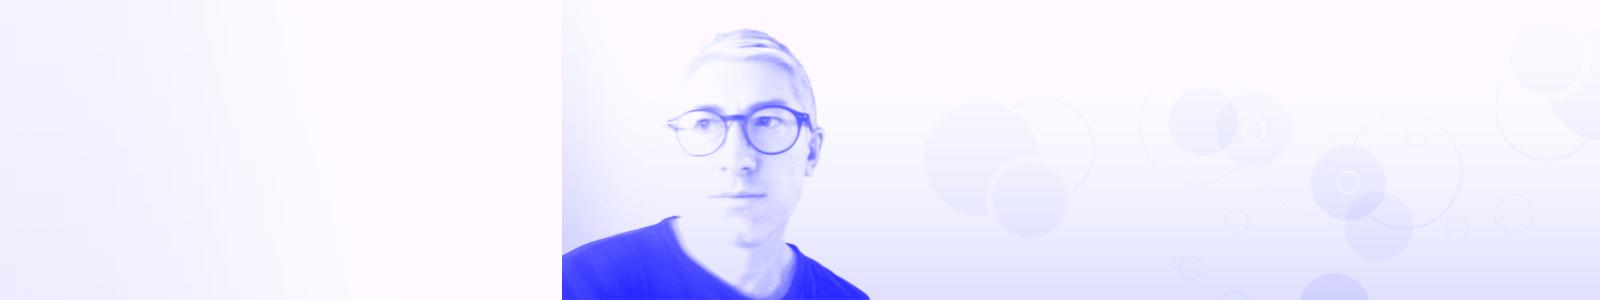 Graphic designer, Adam James Armstrong.